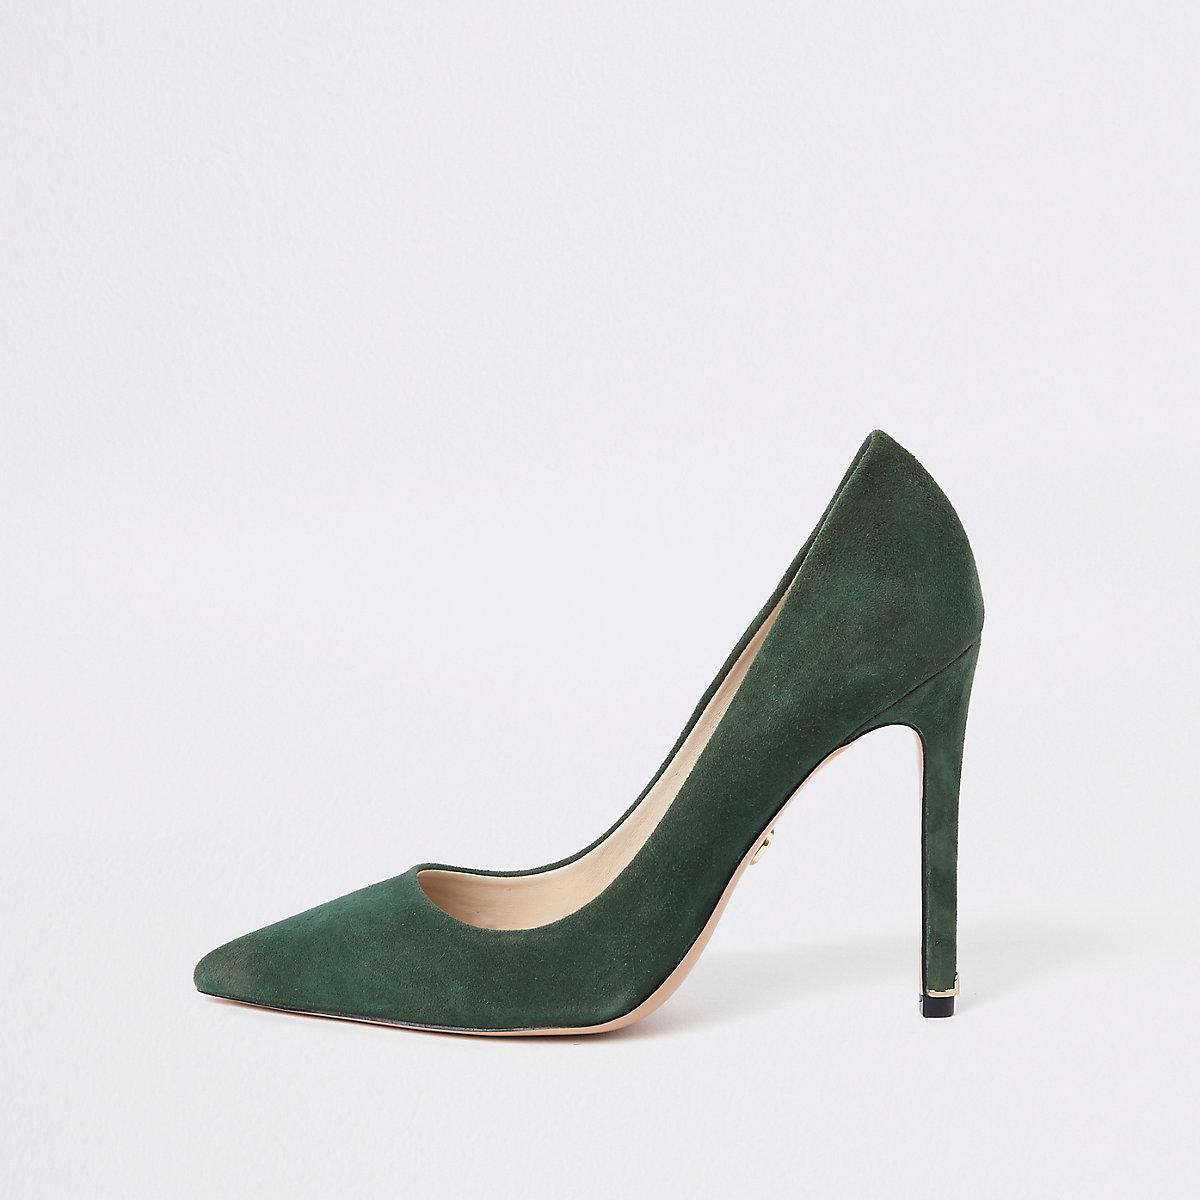 Green suede pumps